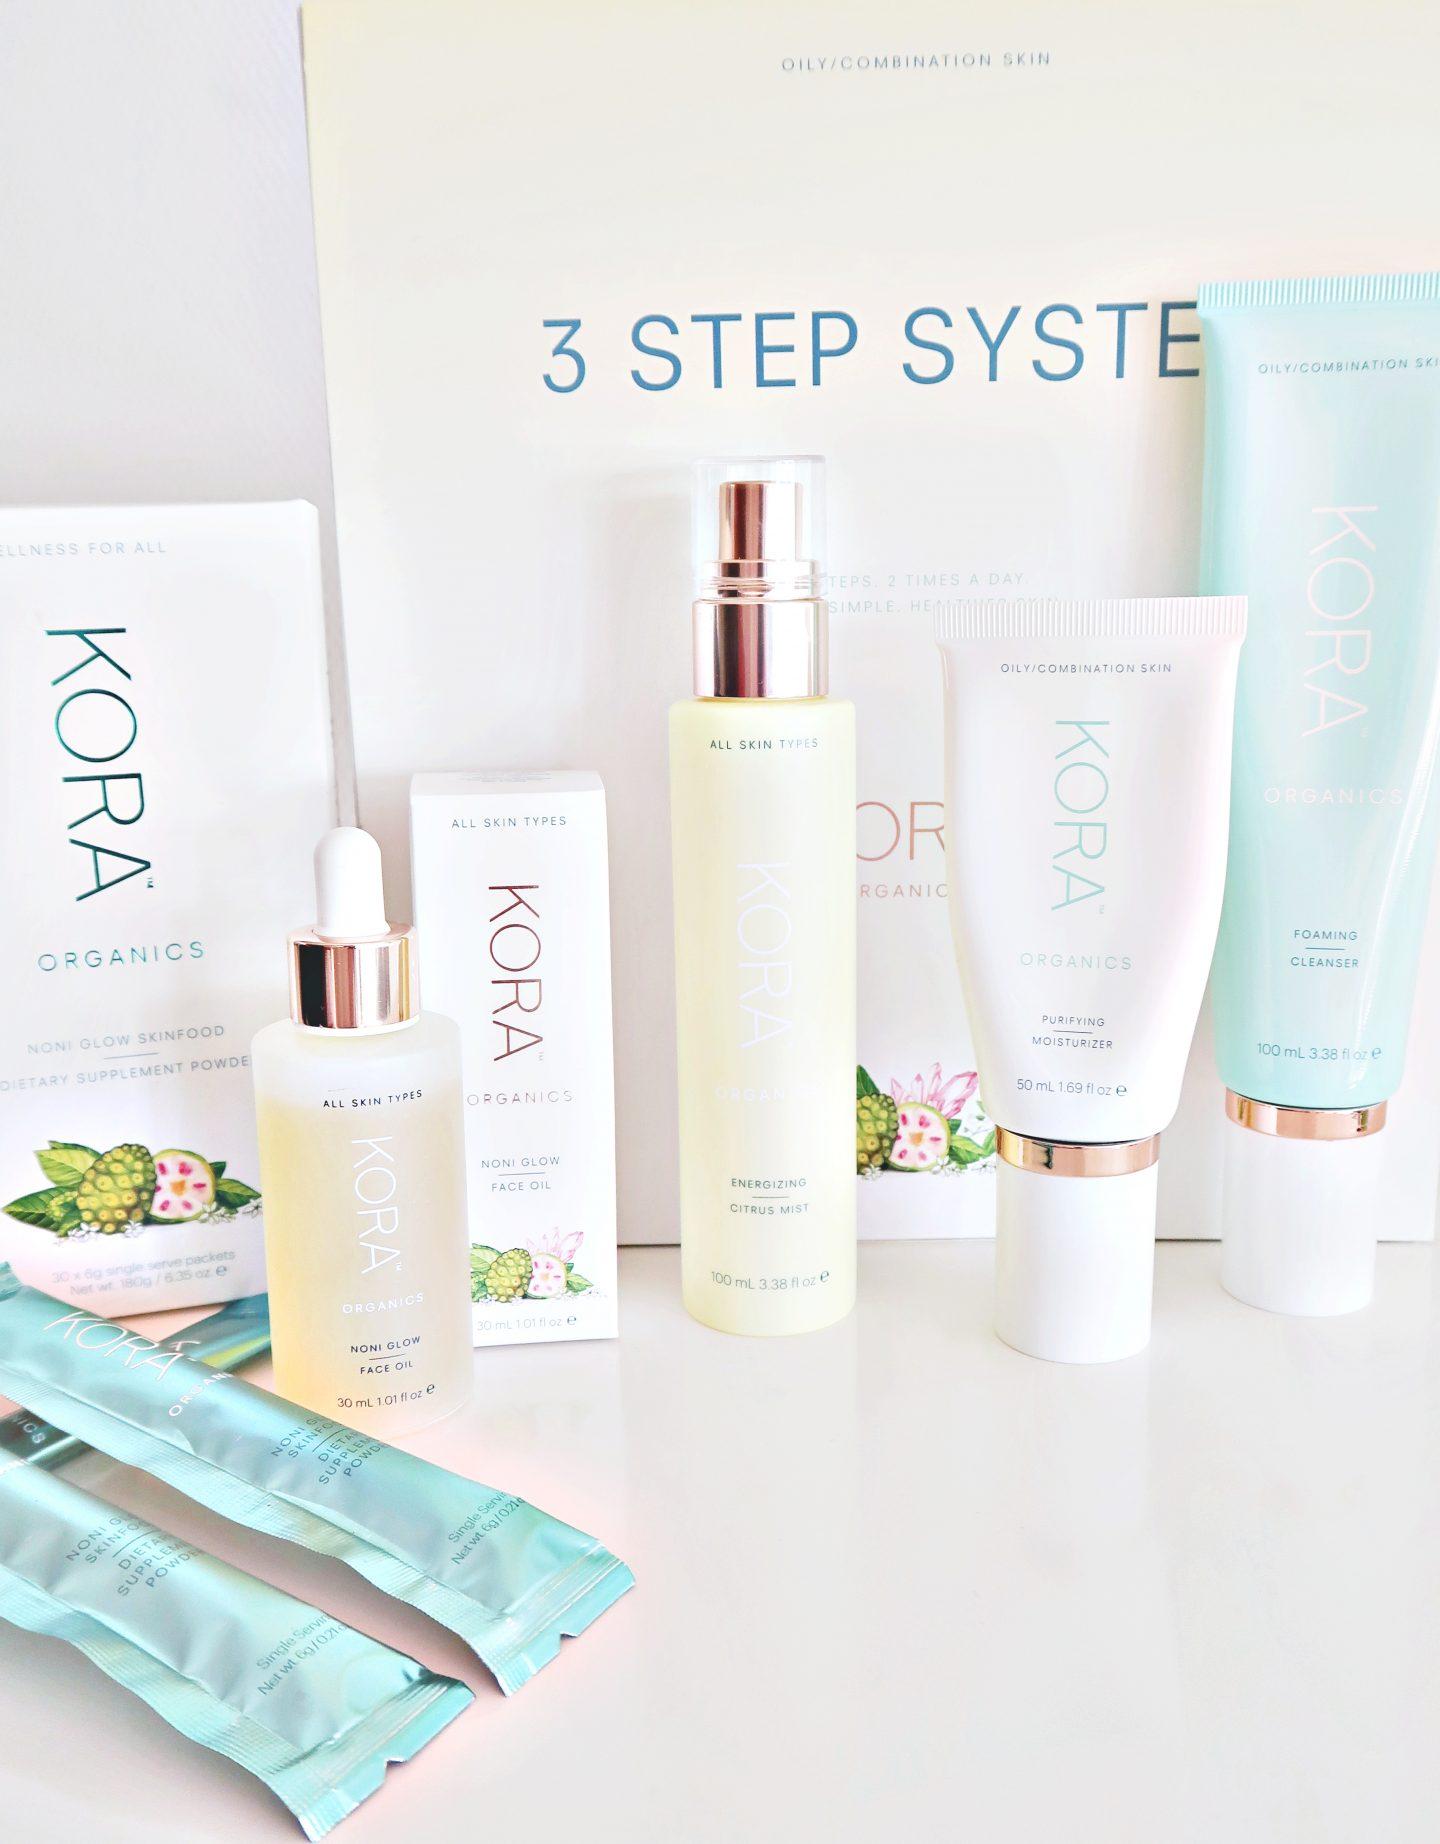 kora organics - 3 step system